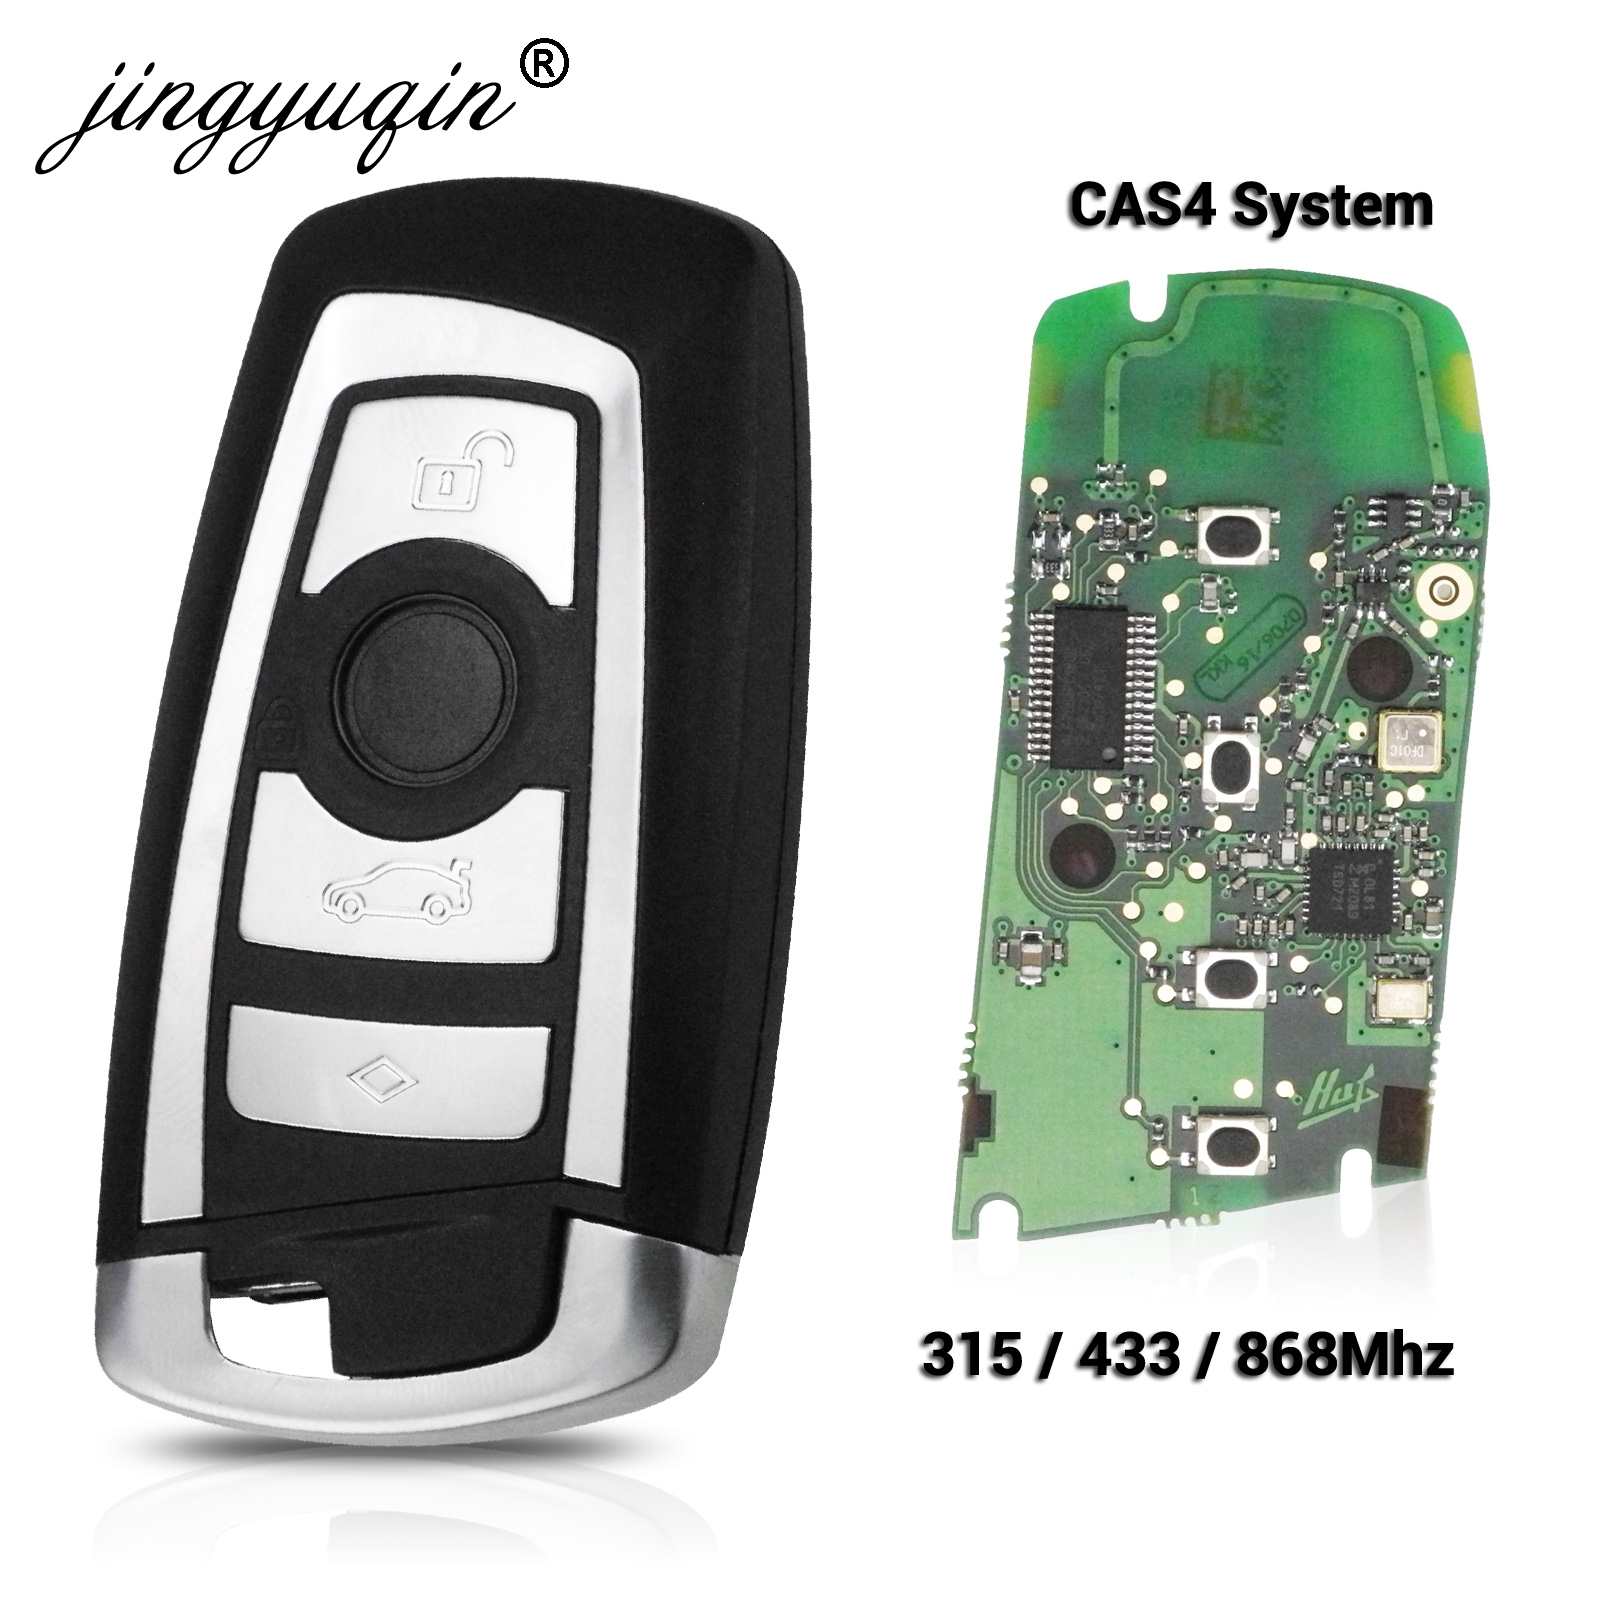 Умный дистанционный ключ jingyuqin 315/433/868 МГц, KeylessGo для BMW 3 5 7 серии 2009-2016, система CAS4 F, брелок KR55WK49863 pcf7945